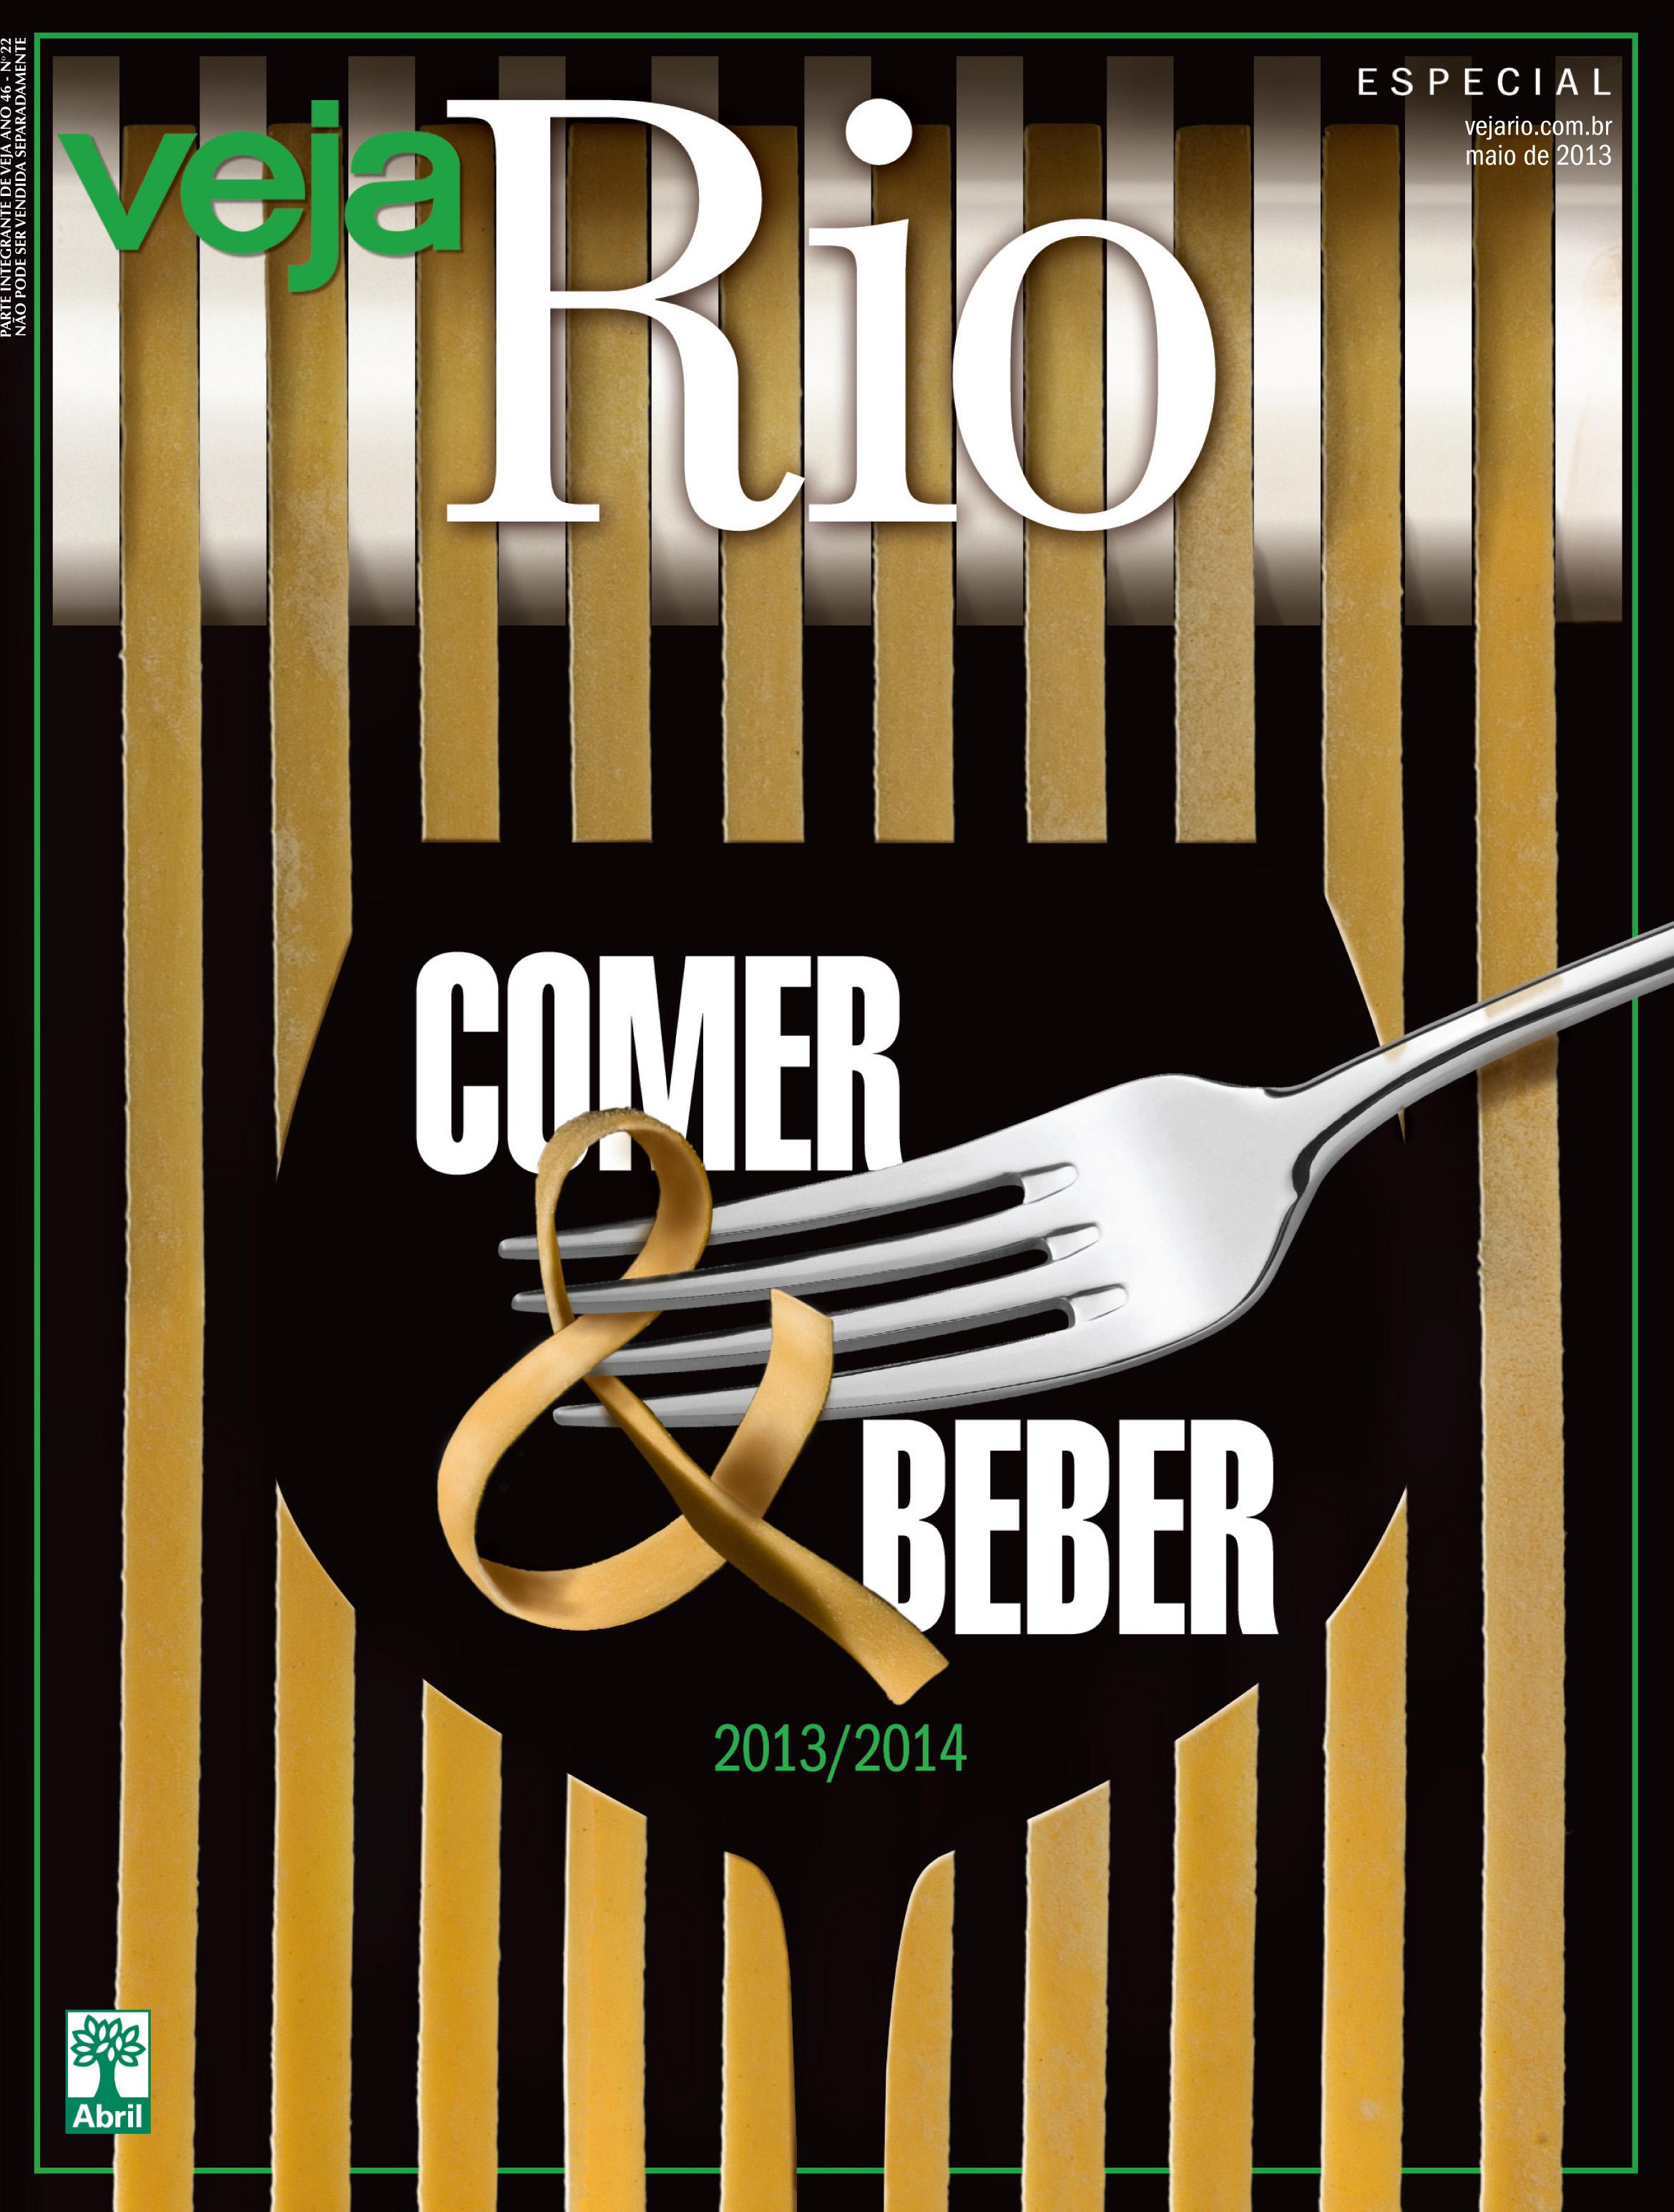 Capa da revista Veja Rio Comer e Beber, de 29 de maio de 2013